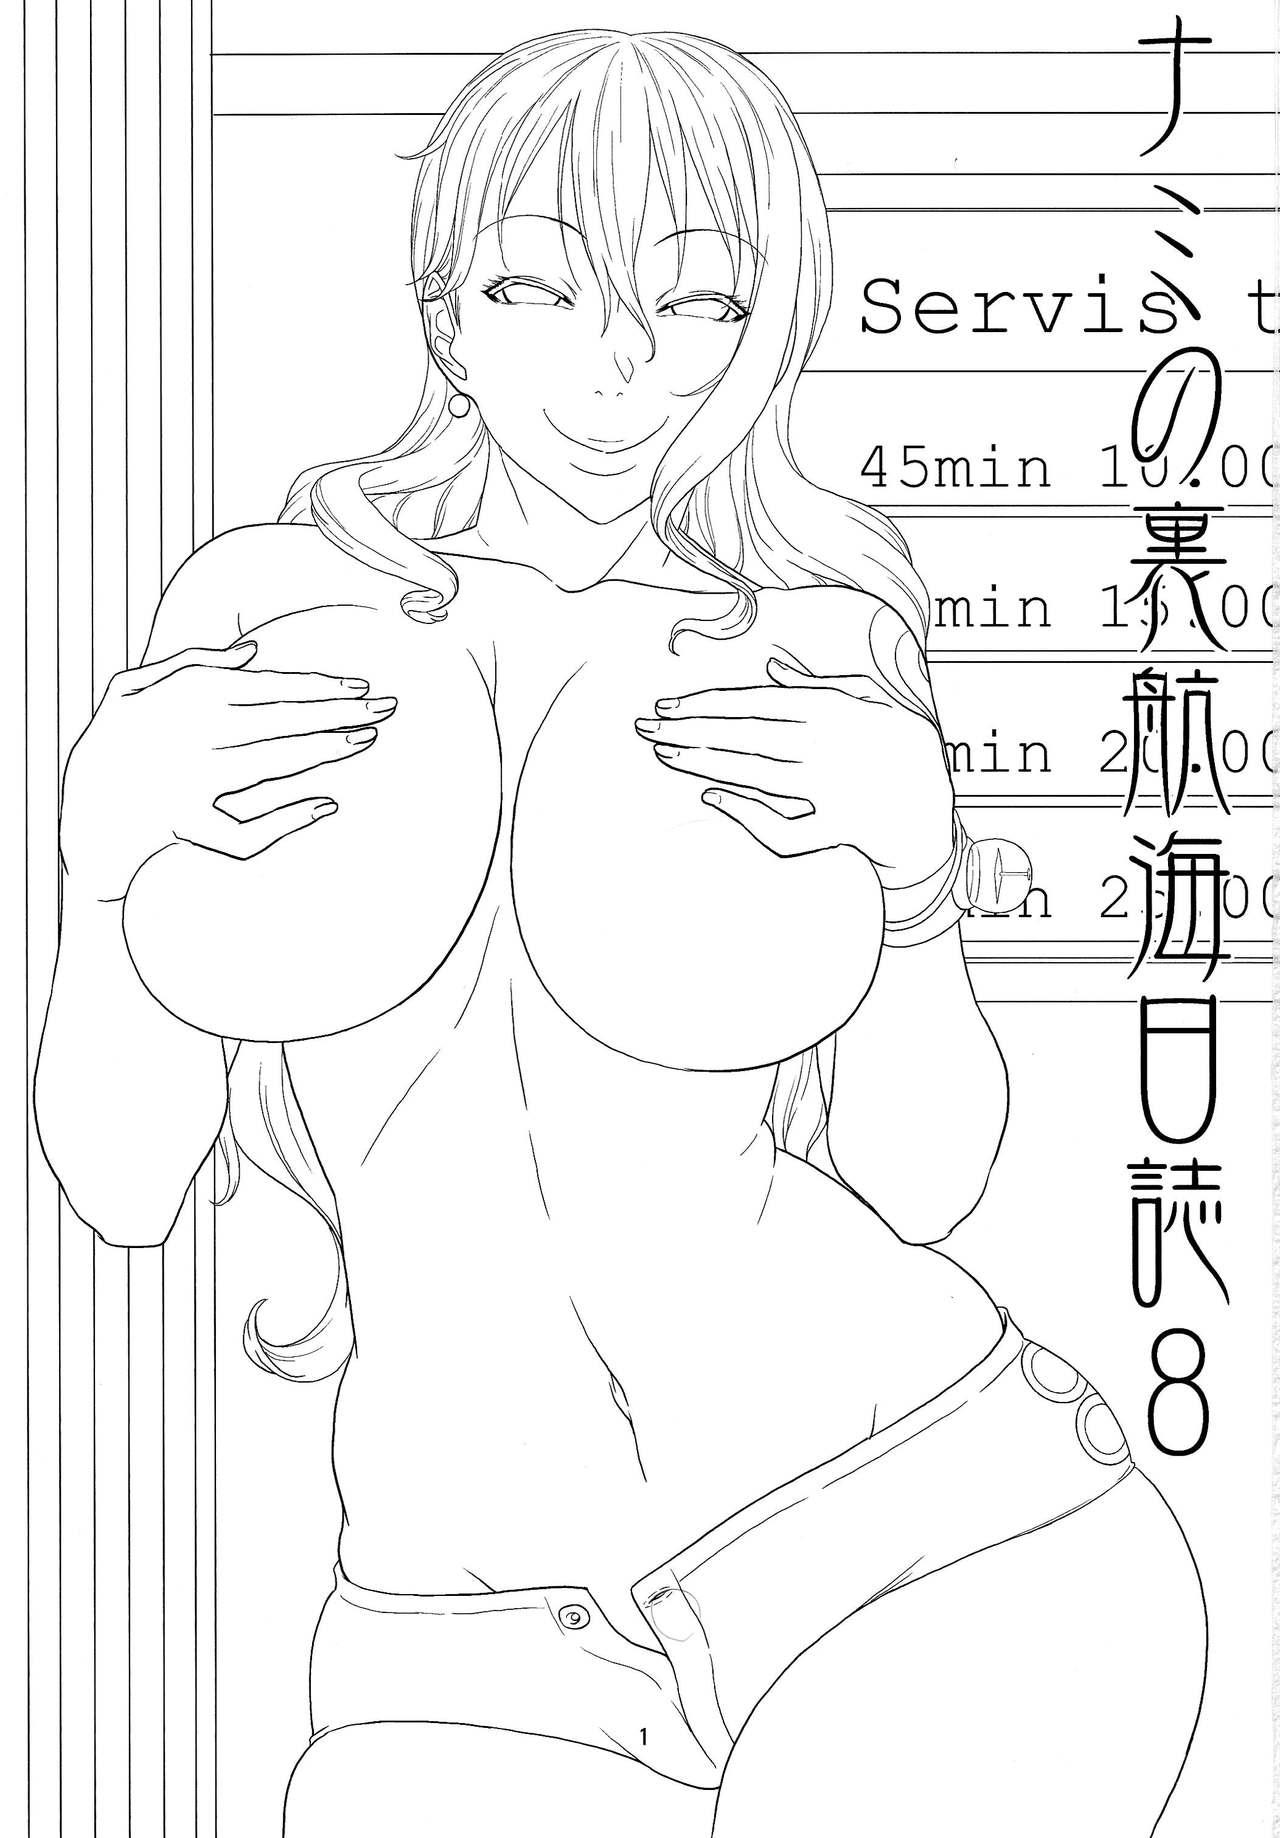 Nami no Ura Koukai Nisshi 8   Nami's Hidden Sailing Diary 8 1